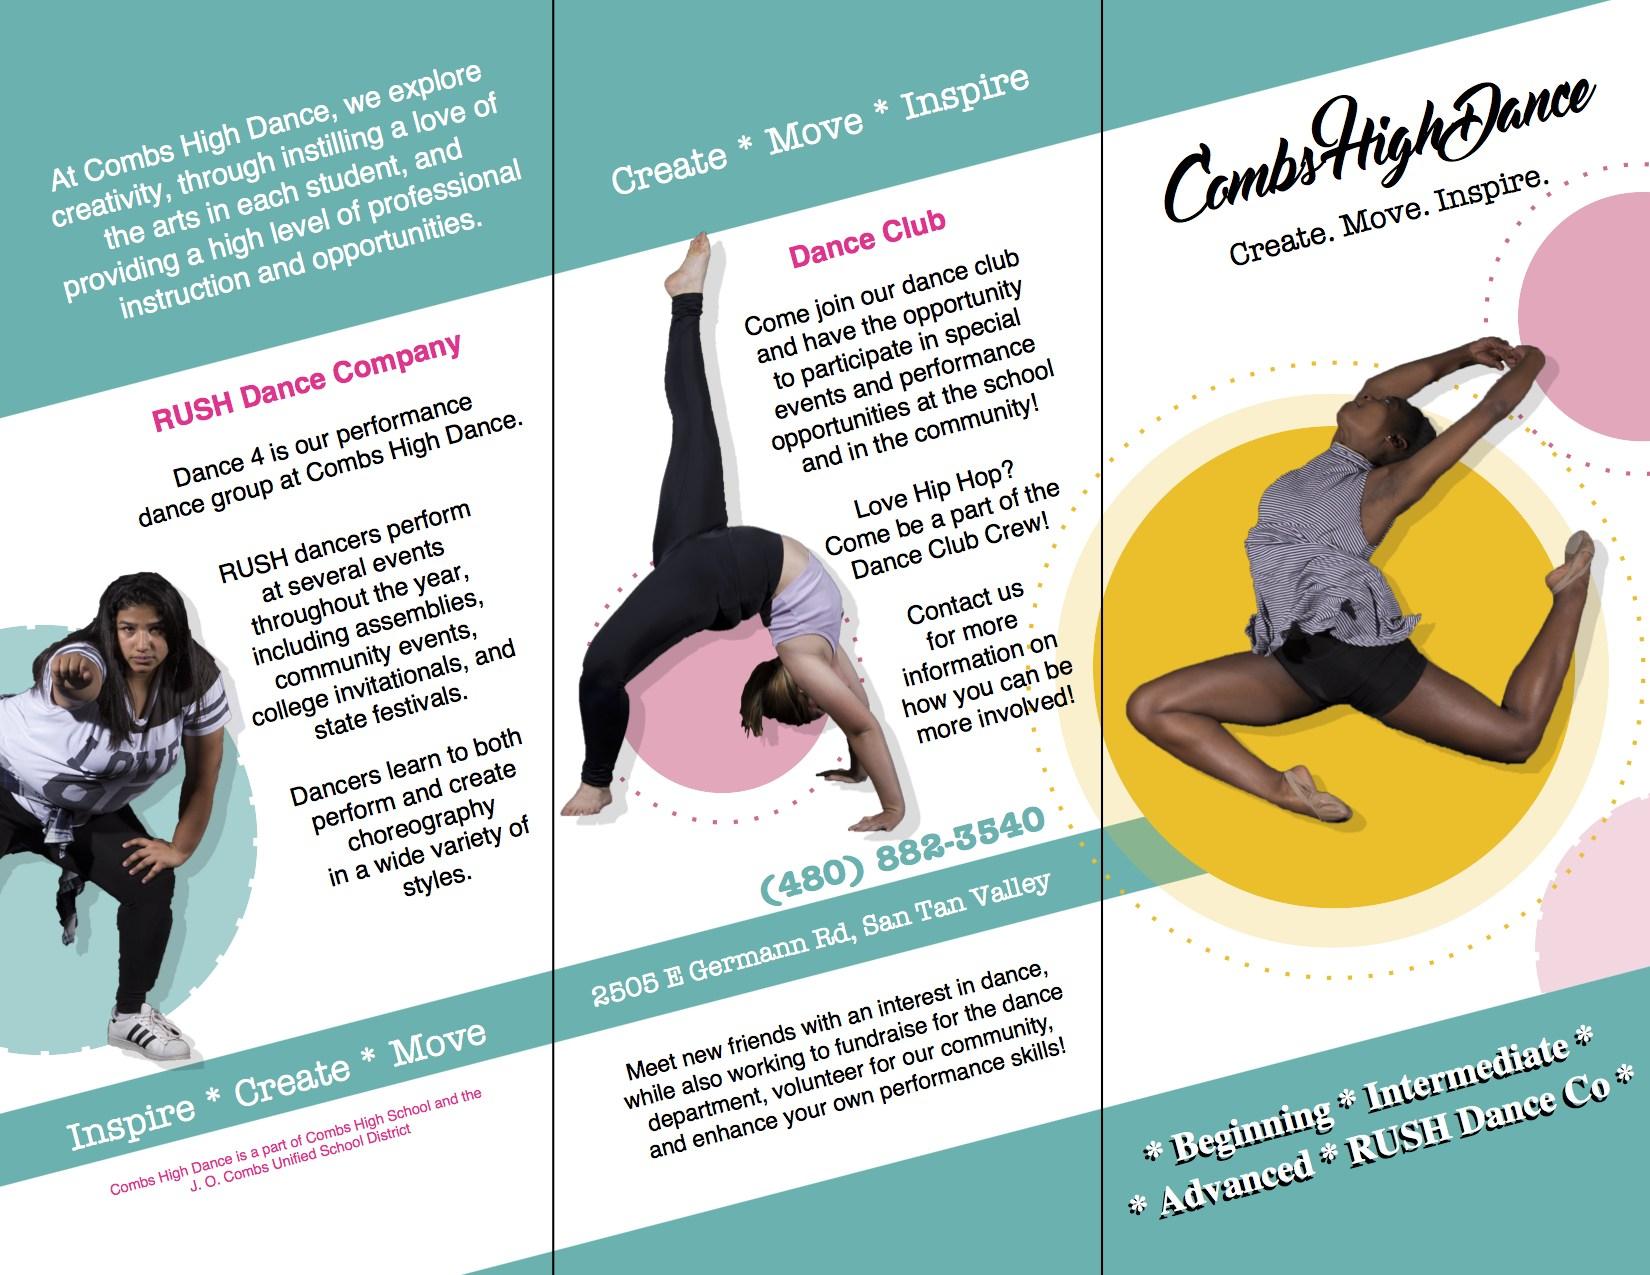 Combs High School Dance Promotional Flyer